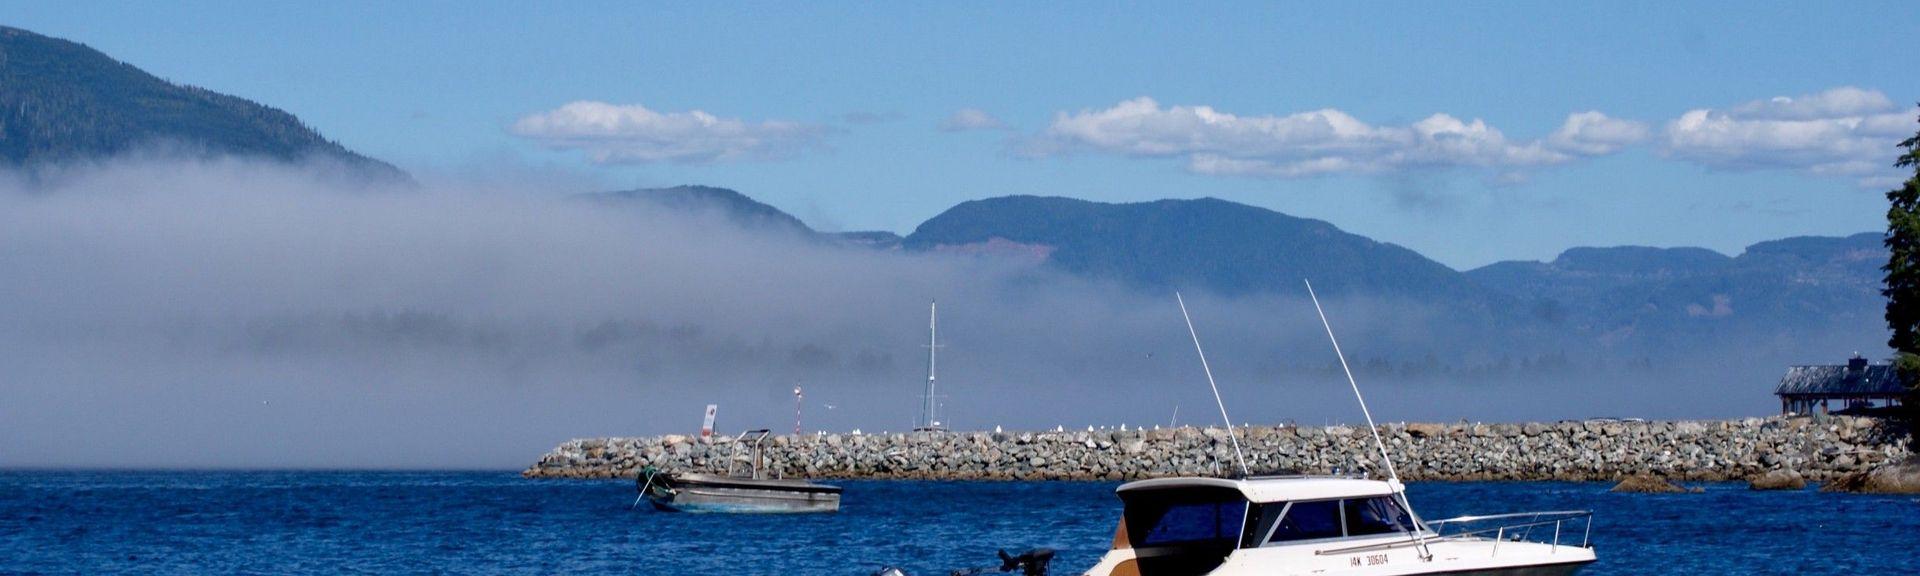 Port Renfrew, Juan de Fuca Electoral Area, British Columbia, Canada